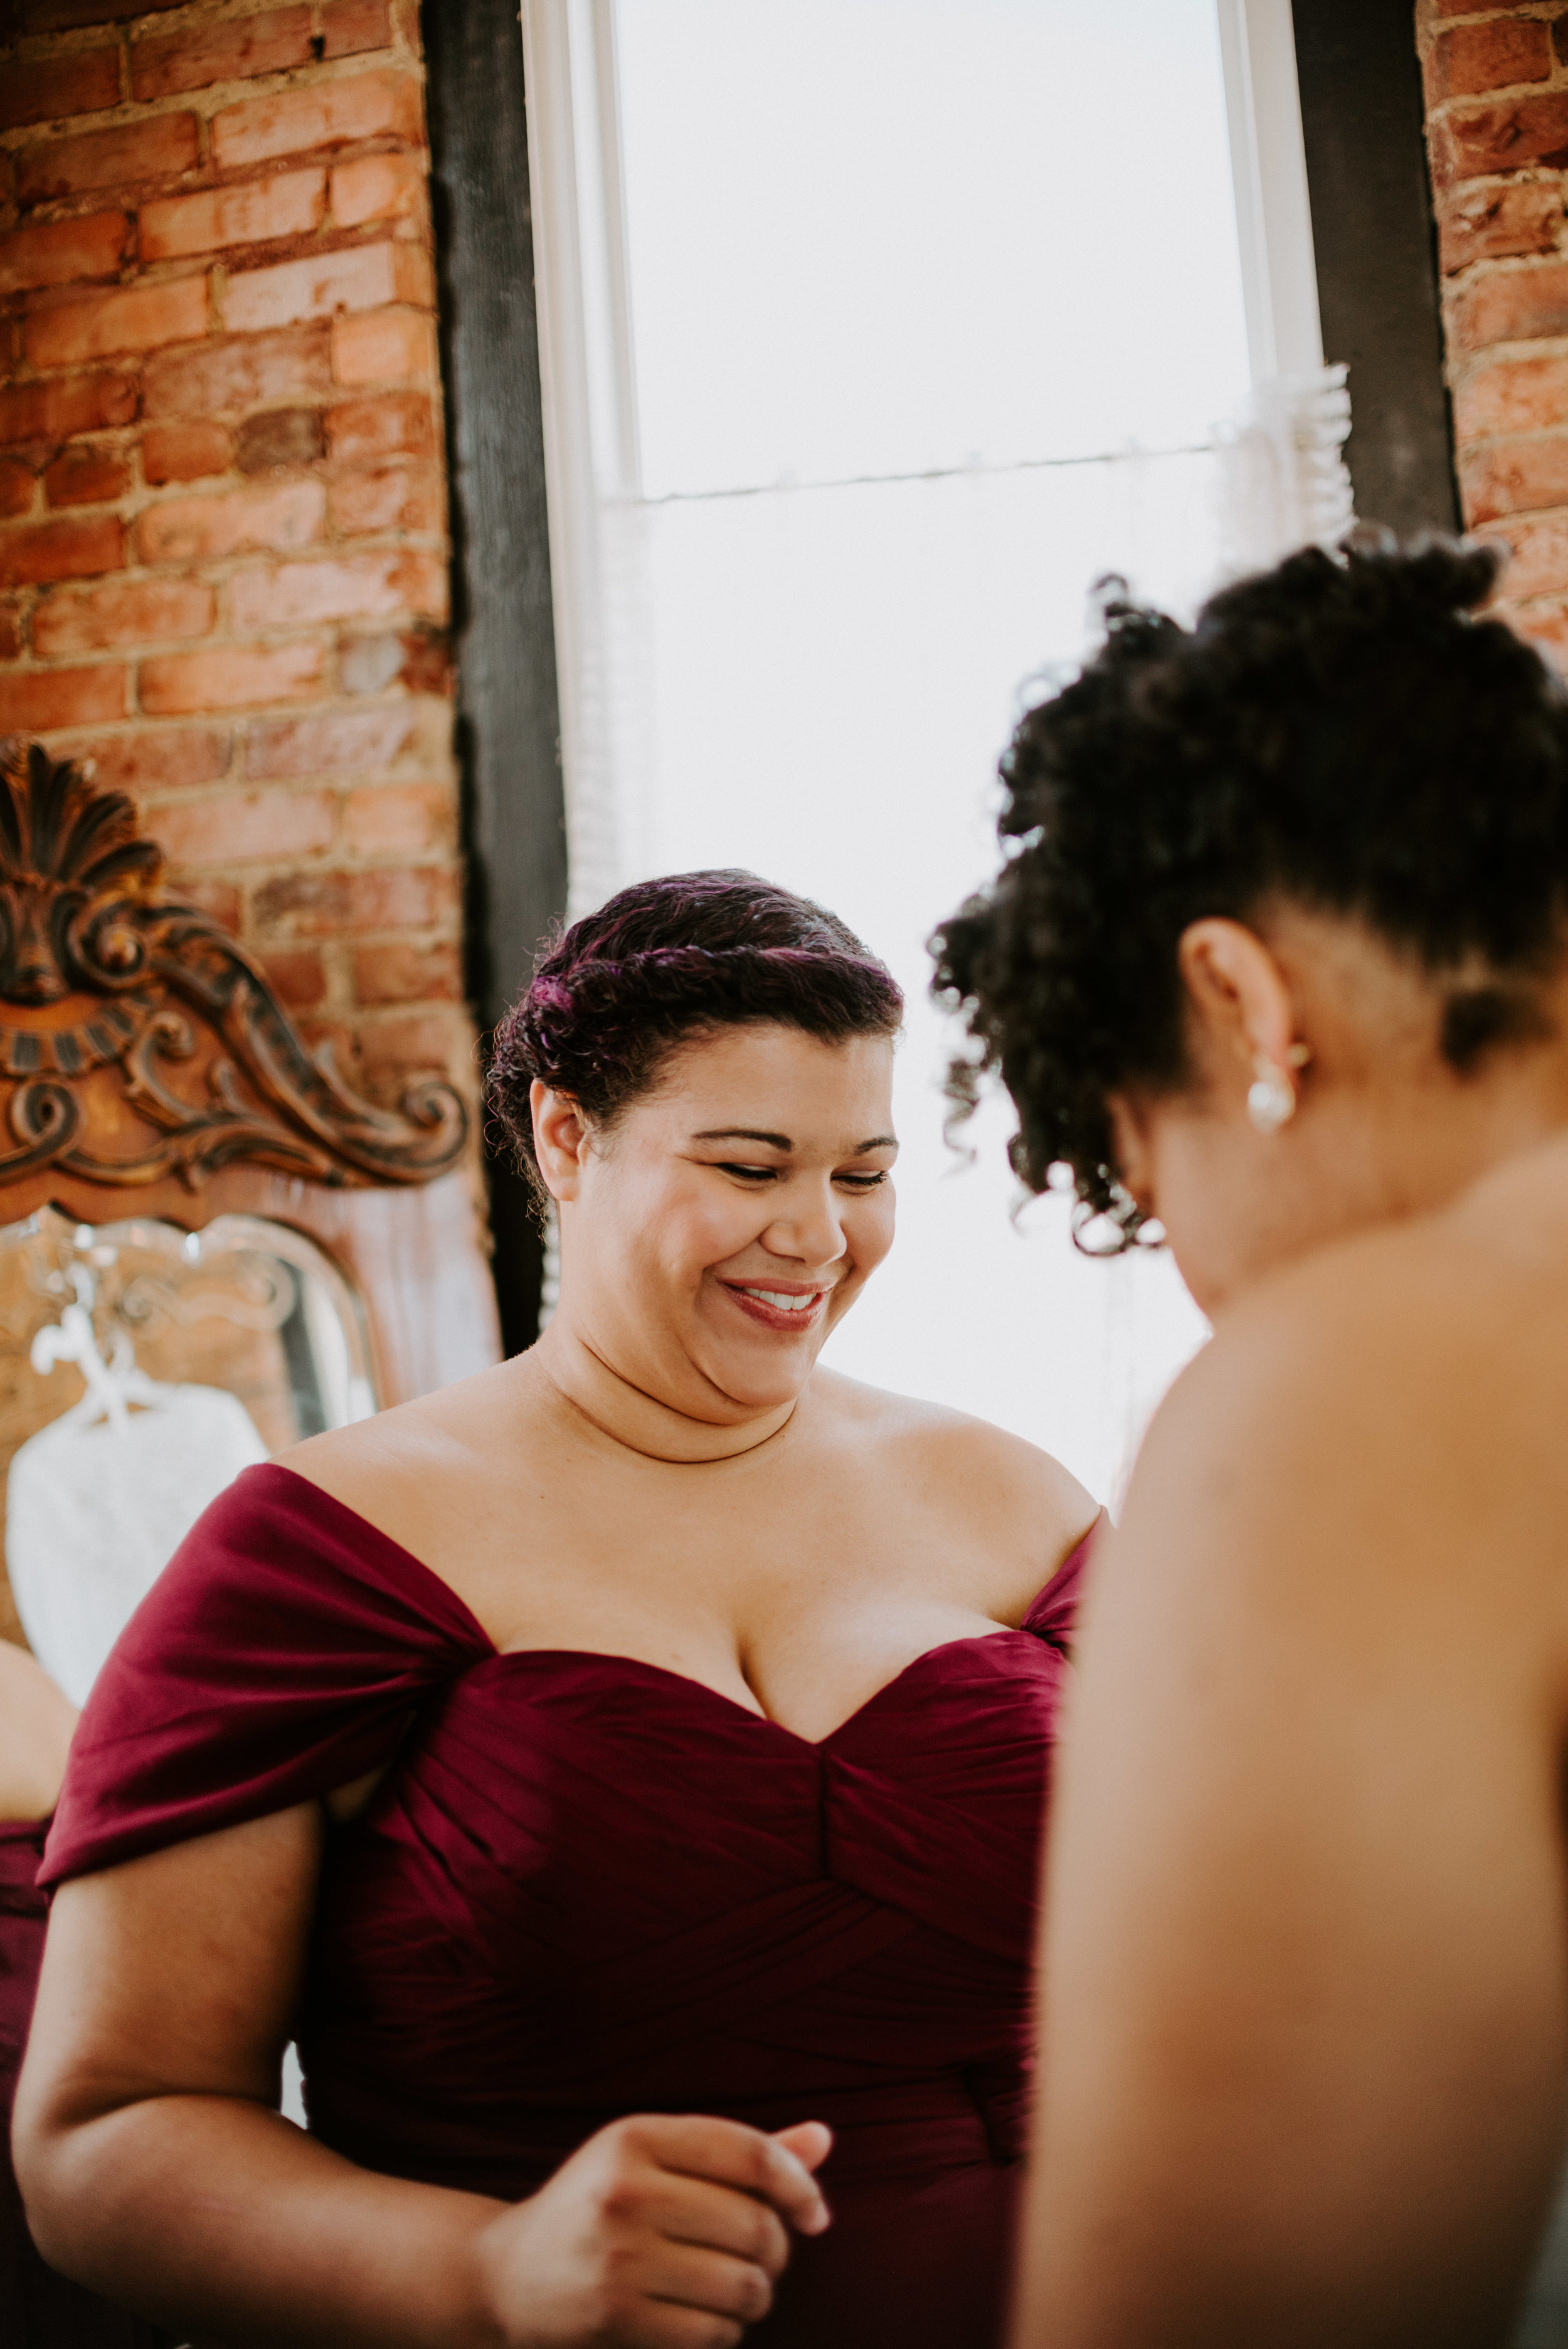 WonderlyCreative_Wedding_6.7.18_Khara&Dwayne_-112.jpg